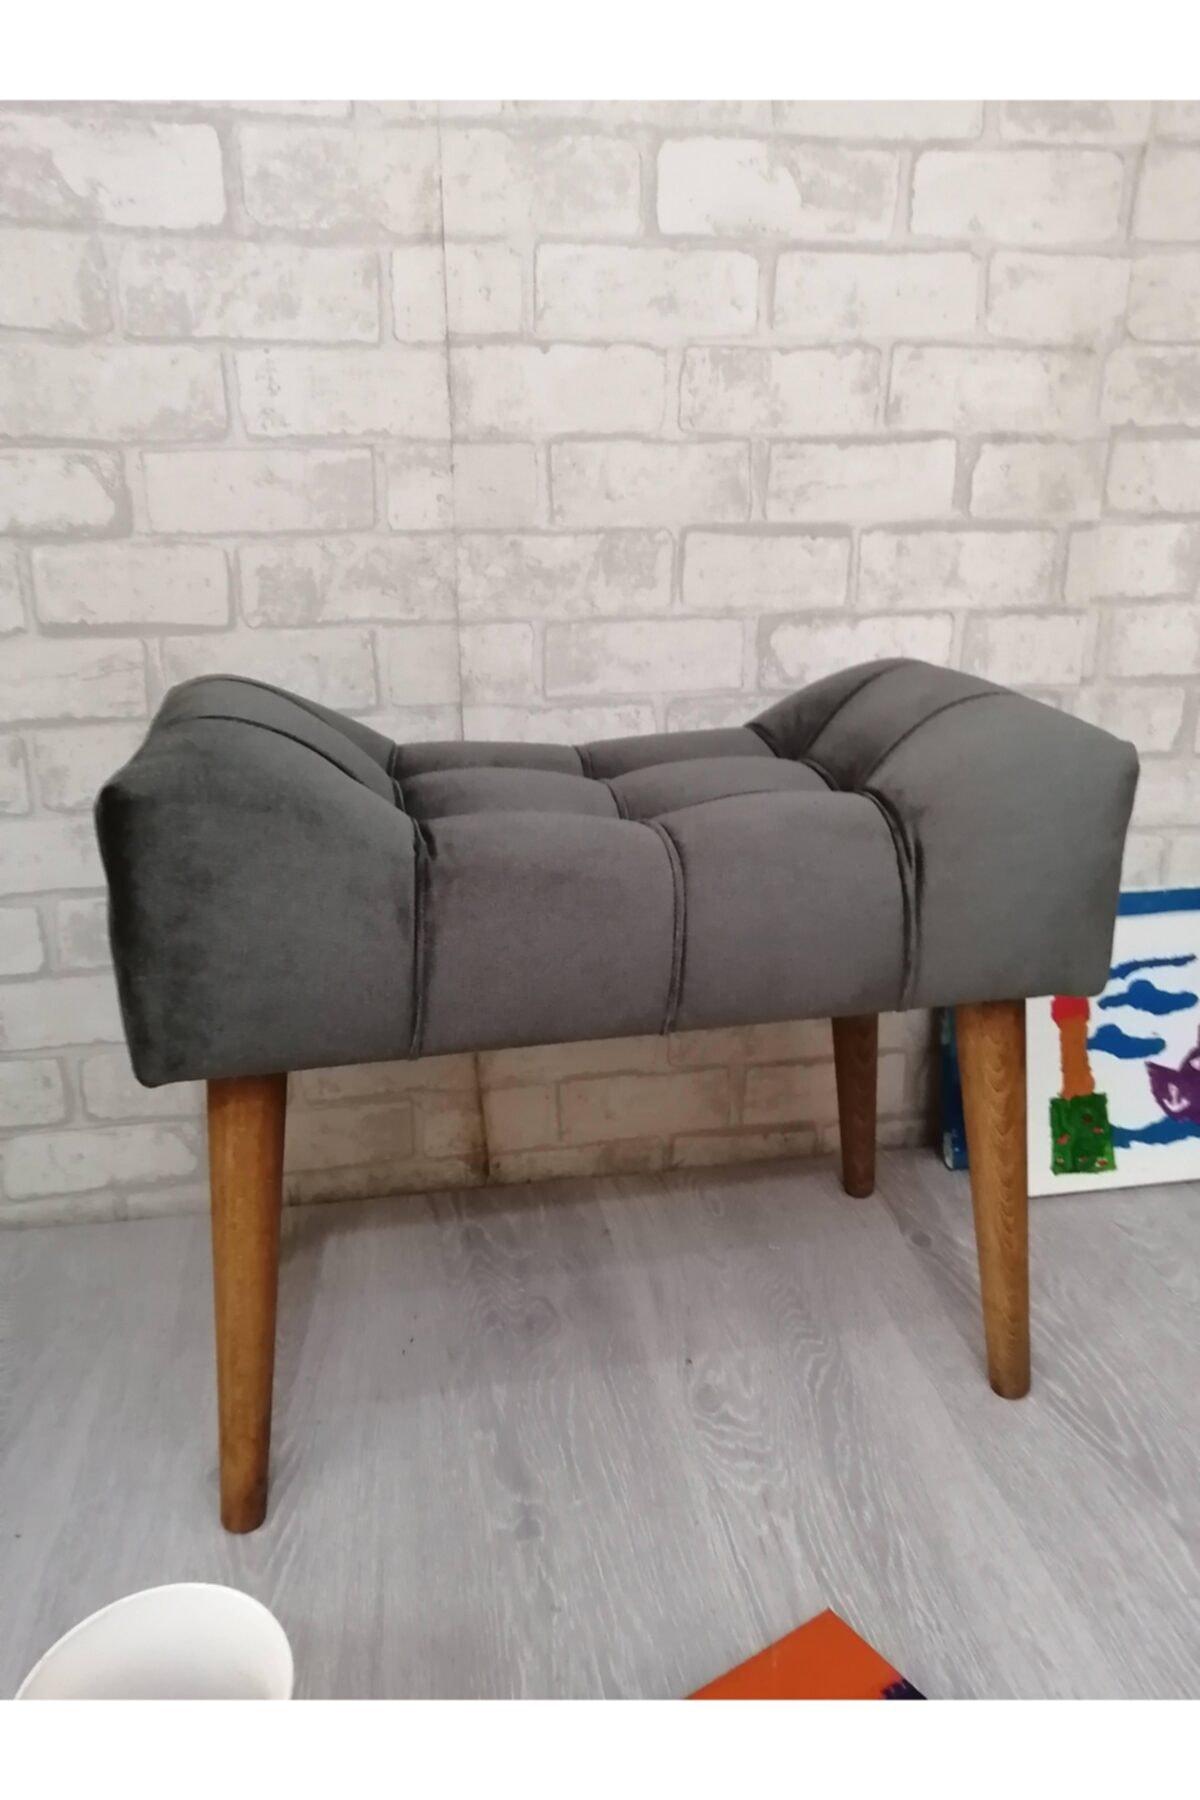 Puf Antrasit Gri , Ahşap Ayaklı ,spor Puf , Modern Tasarım 33049